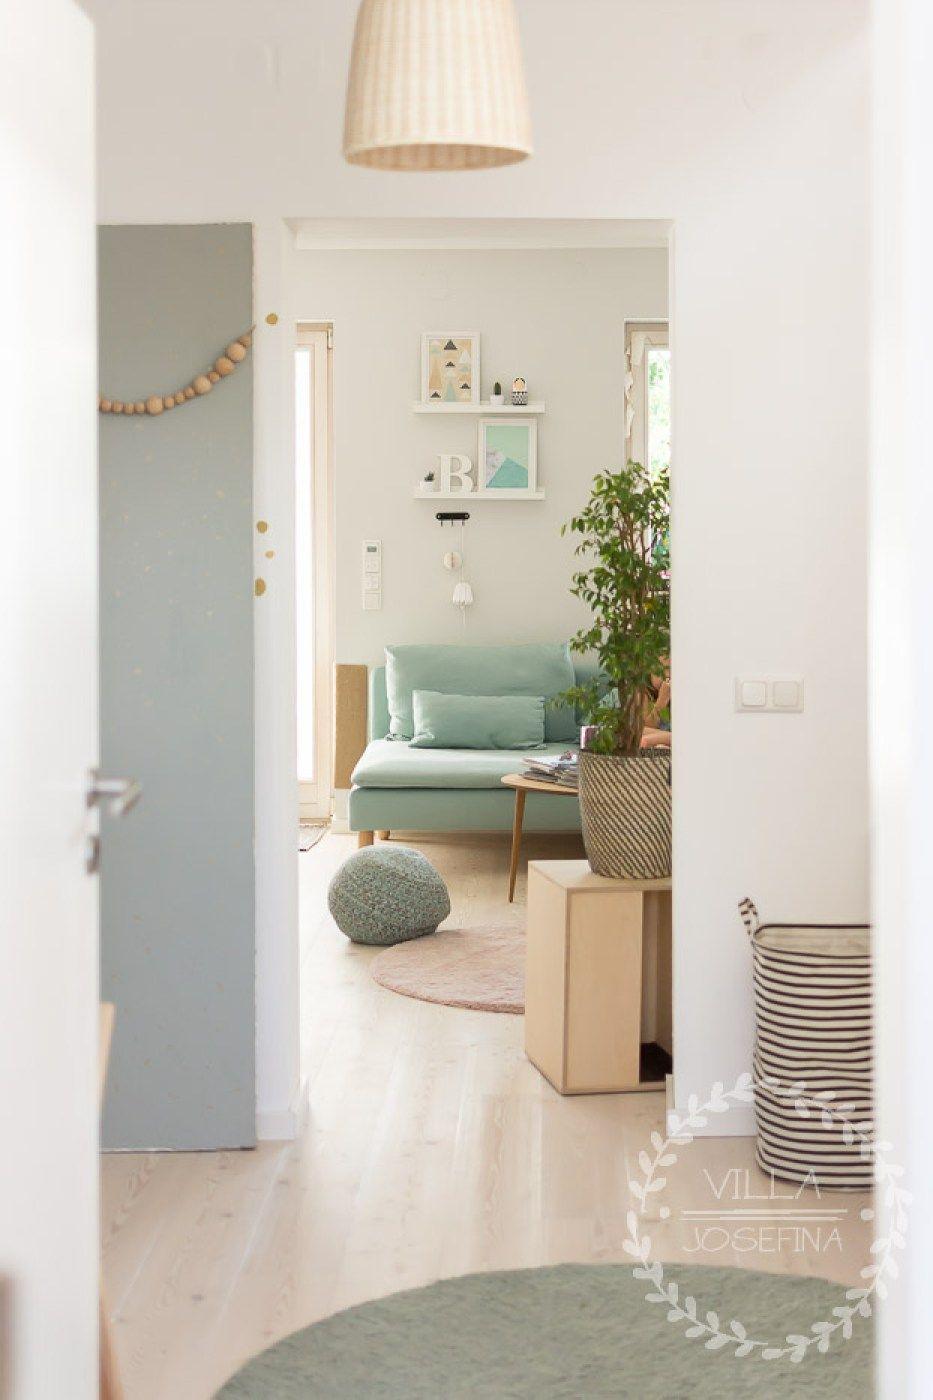 Durchblick Durch Unser Umgebautes Erdgeschoss. Renovierung Reihenhaus    Wohnzimmer Einrichten   Lärchenholz   Offenes Erdgeschoss